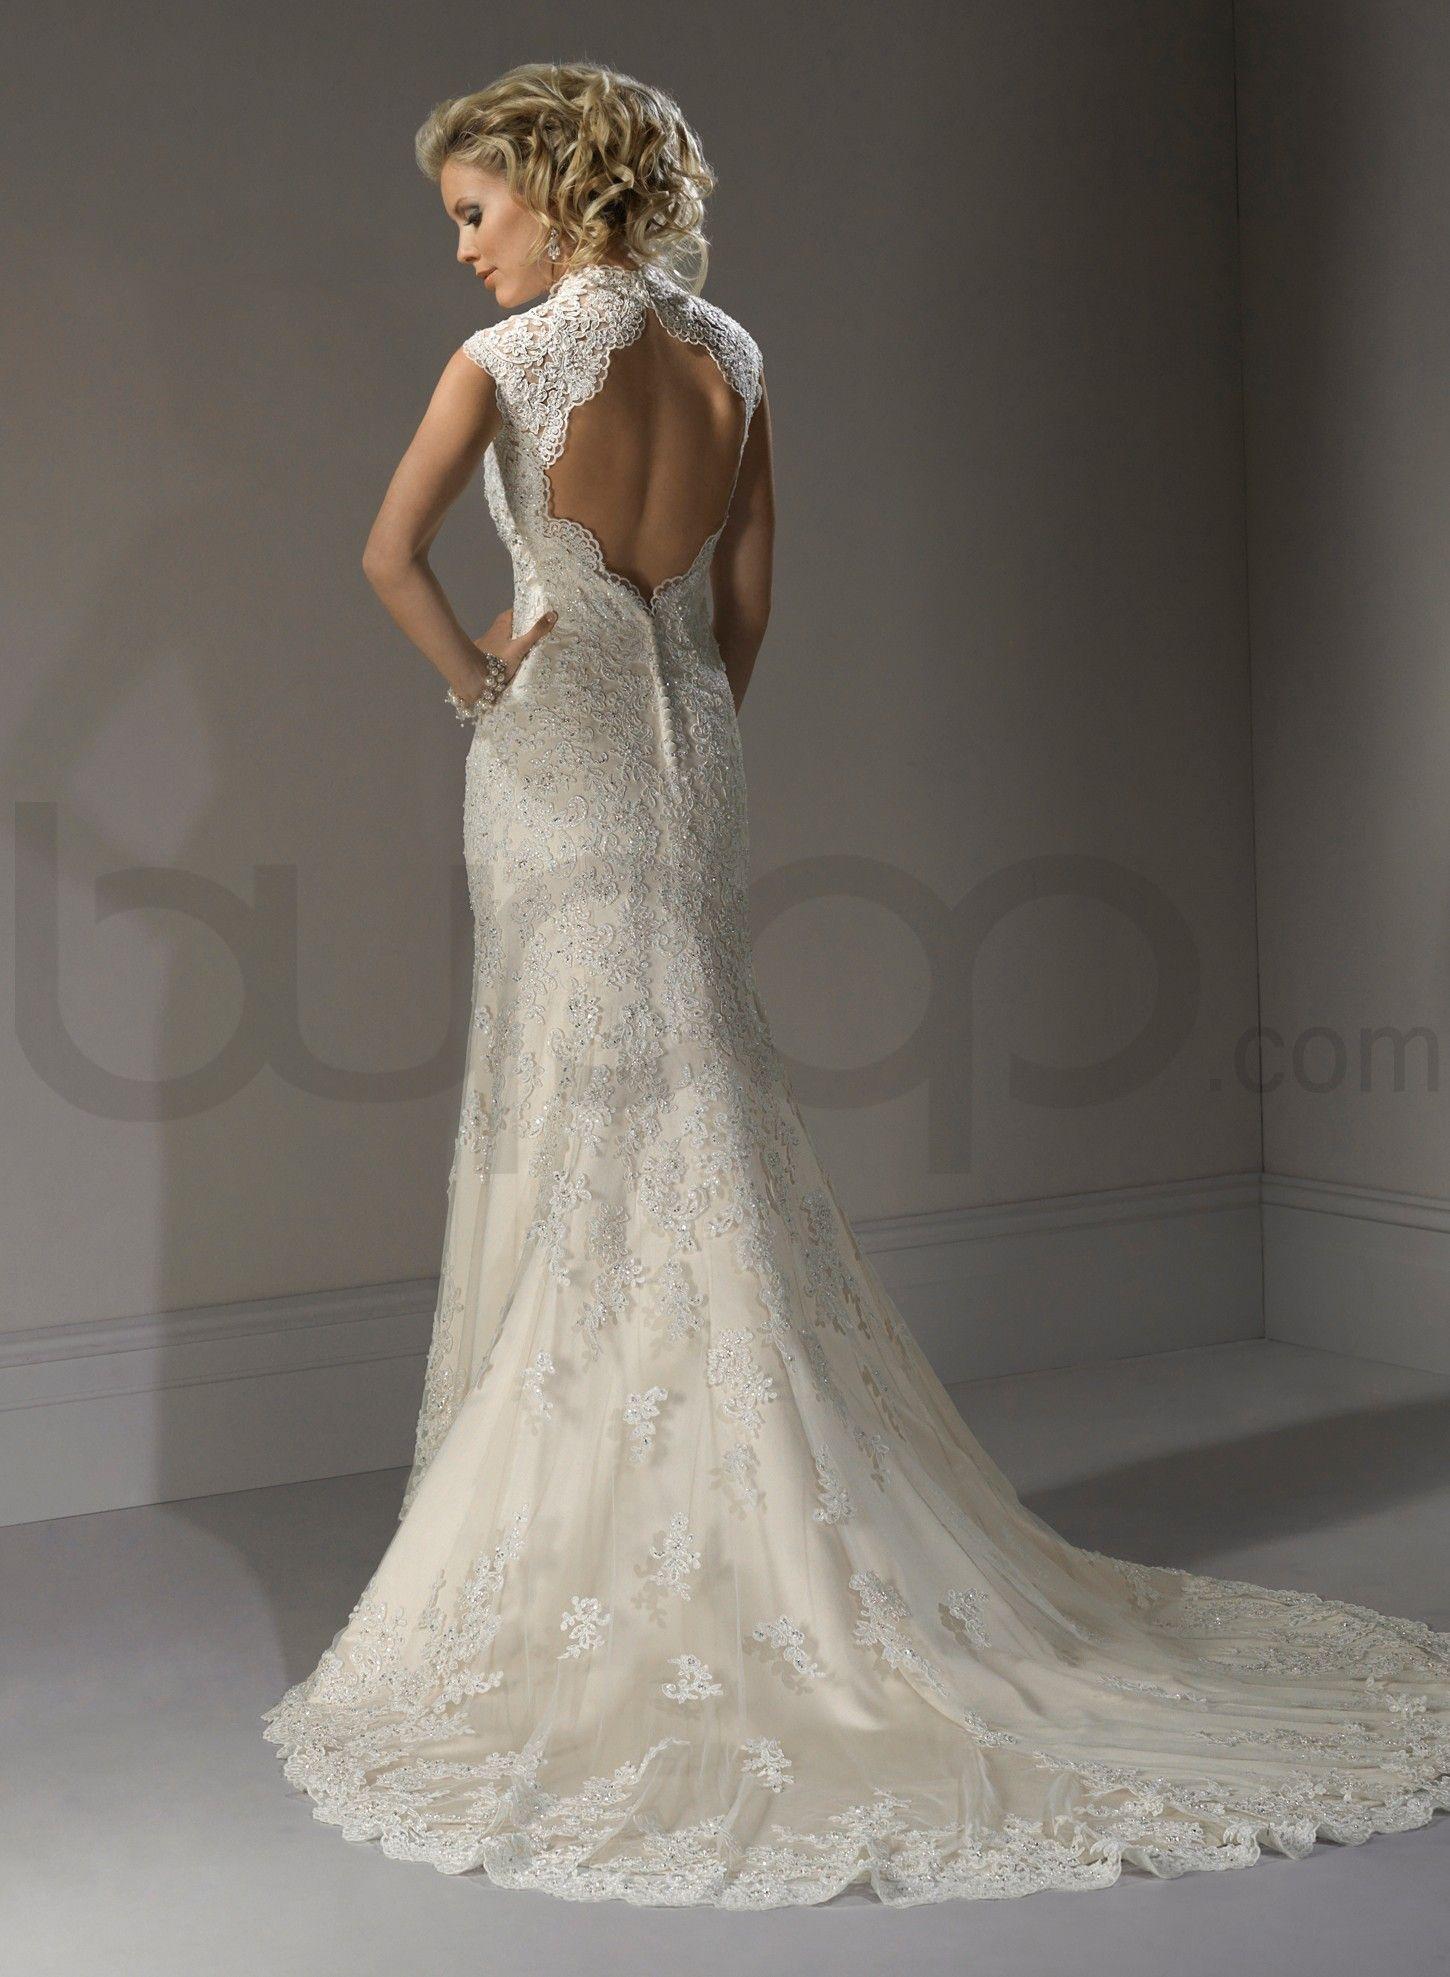 Lace sweetheart neckline a line wedding dress girls in white lace sweetheart neckline a line wedding dress junglespirit Gallery